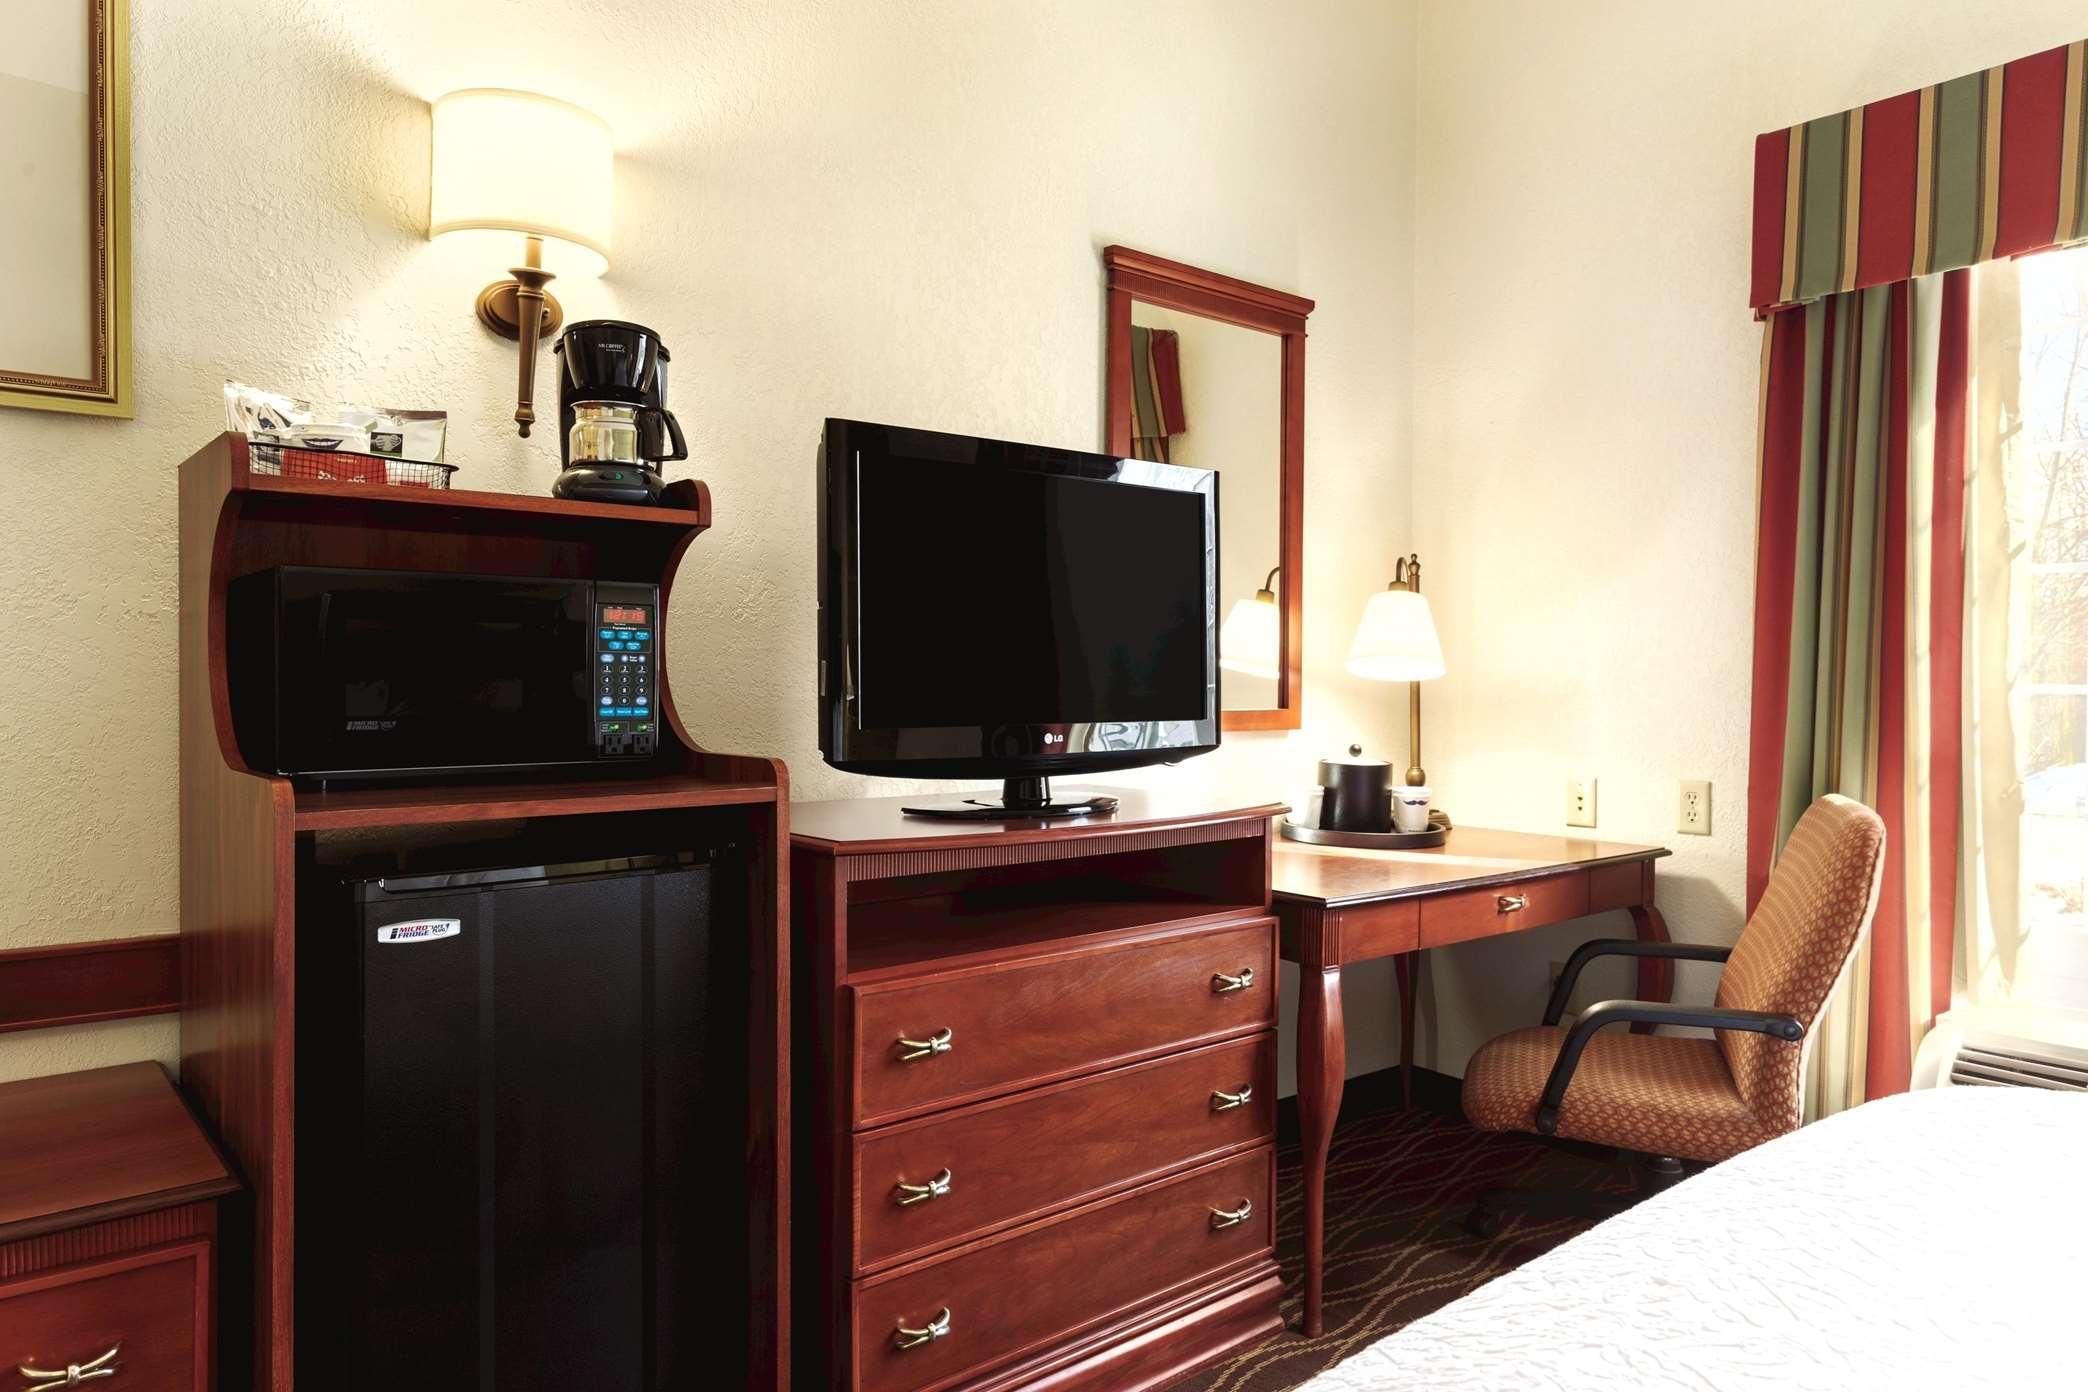 Hampton Inn & Suites Greenfield image 28